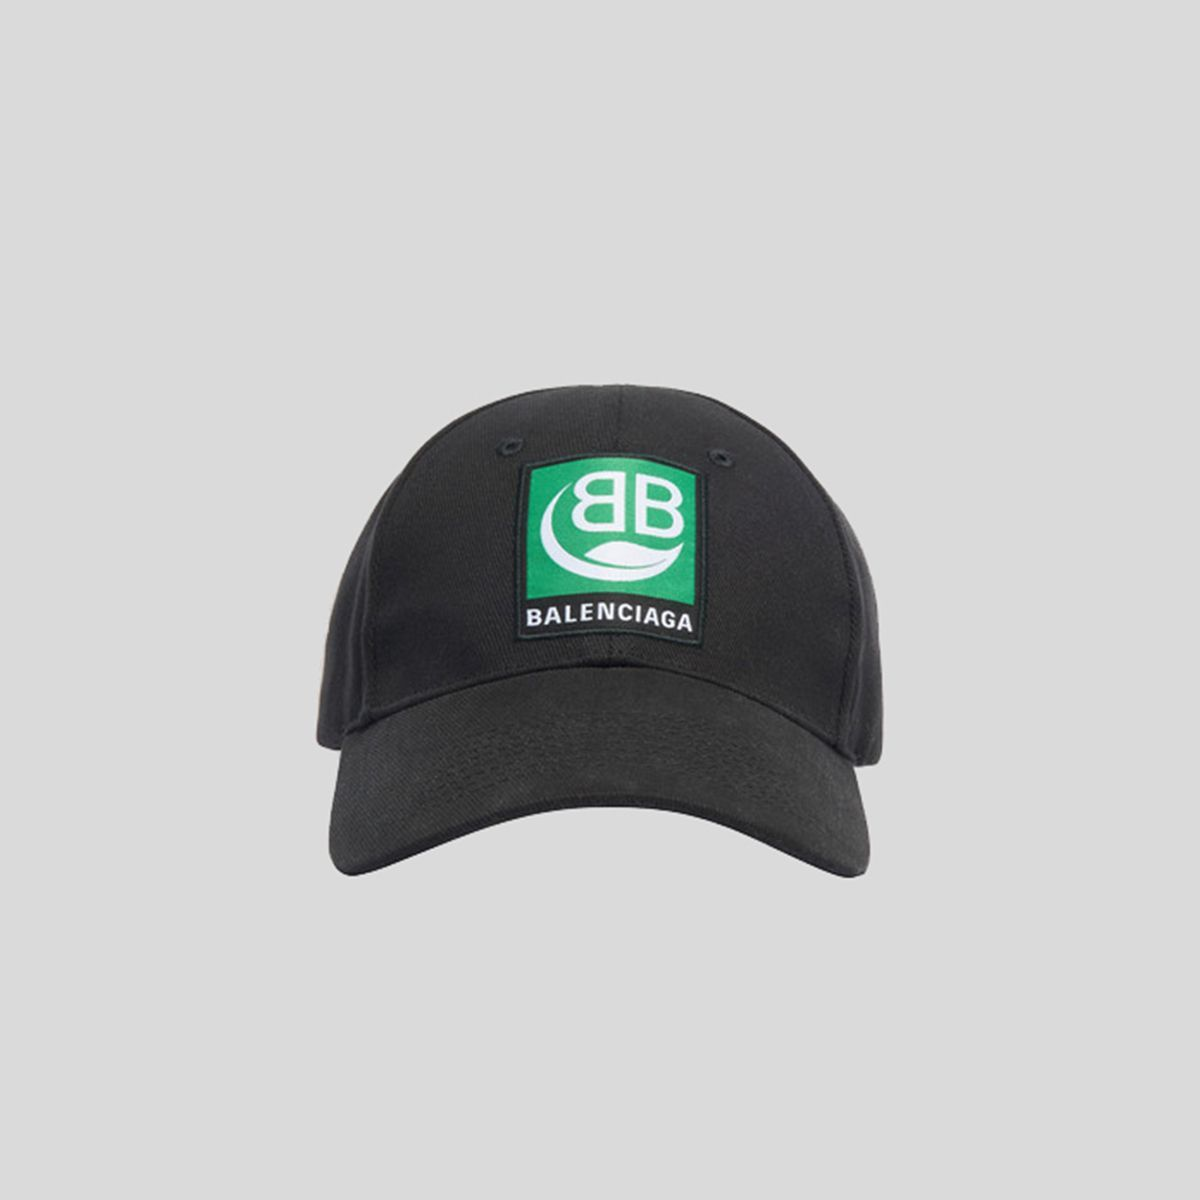 BALENCIAGA バレンシアガ グリーンロゴキャップ Green Logo Cap